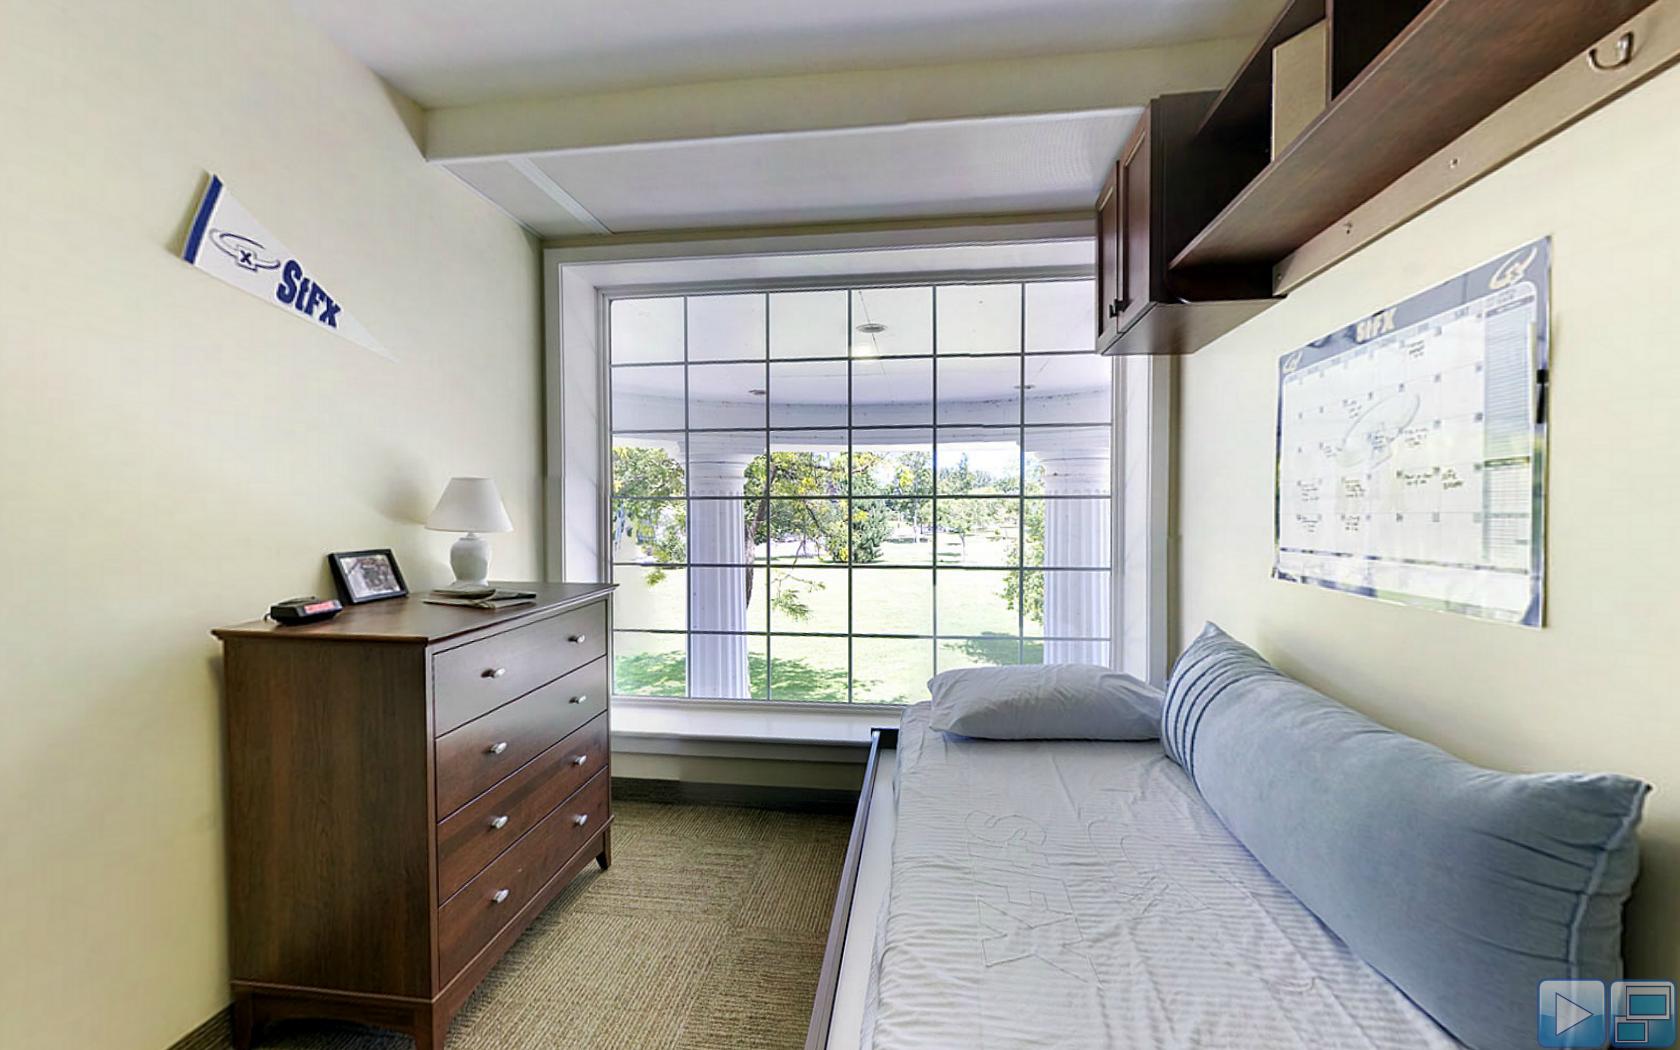 Dresser Bed And Overhead Storage In Bishops Window Is